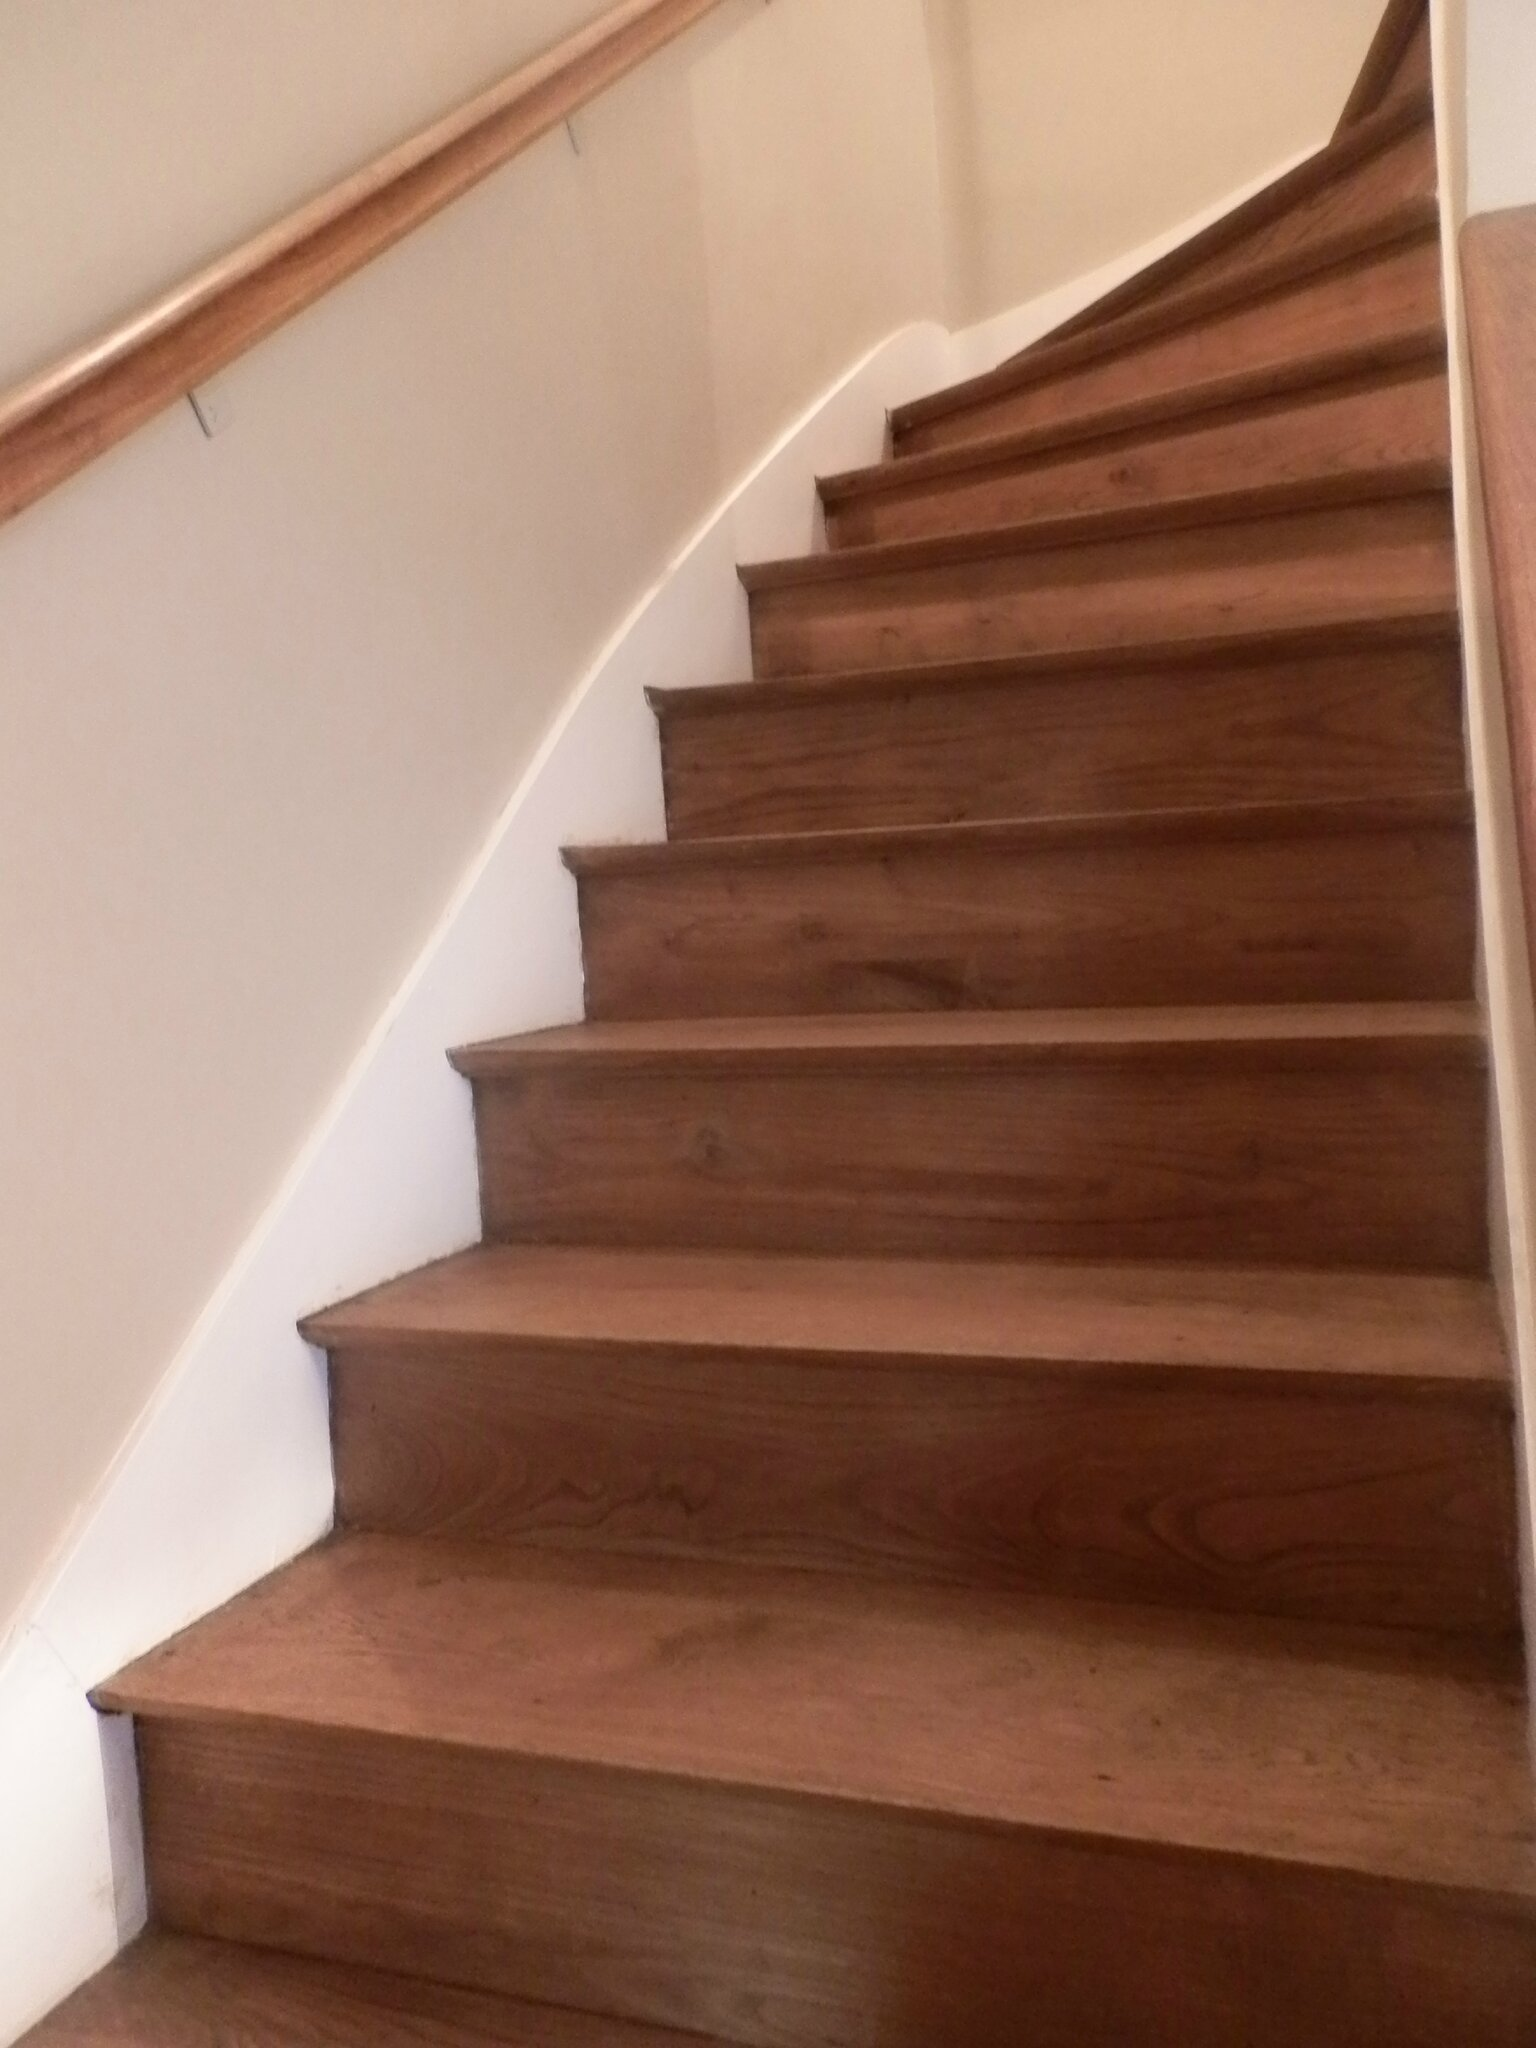 relooking escalier le grenier de christelle. Black Bedroom Furniture Sets. Home Design Ideas